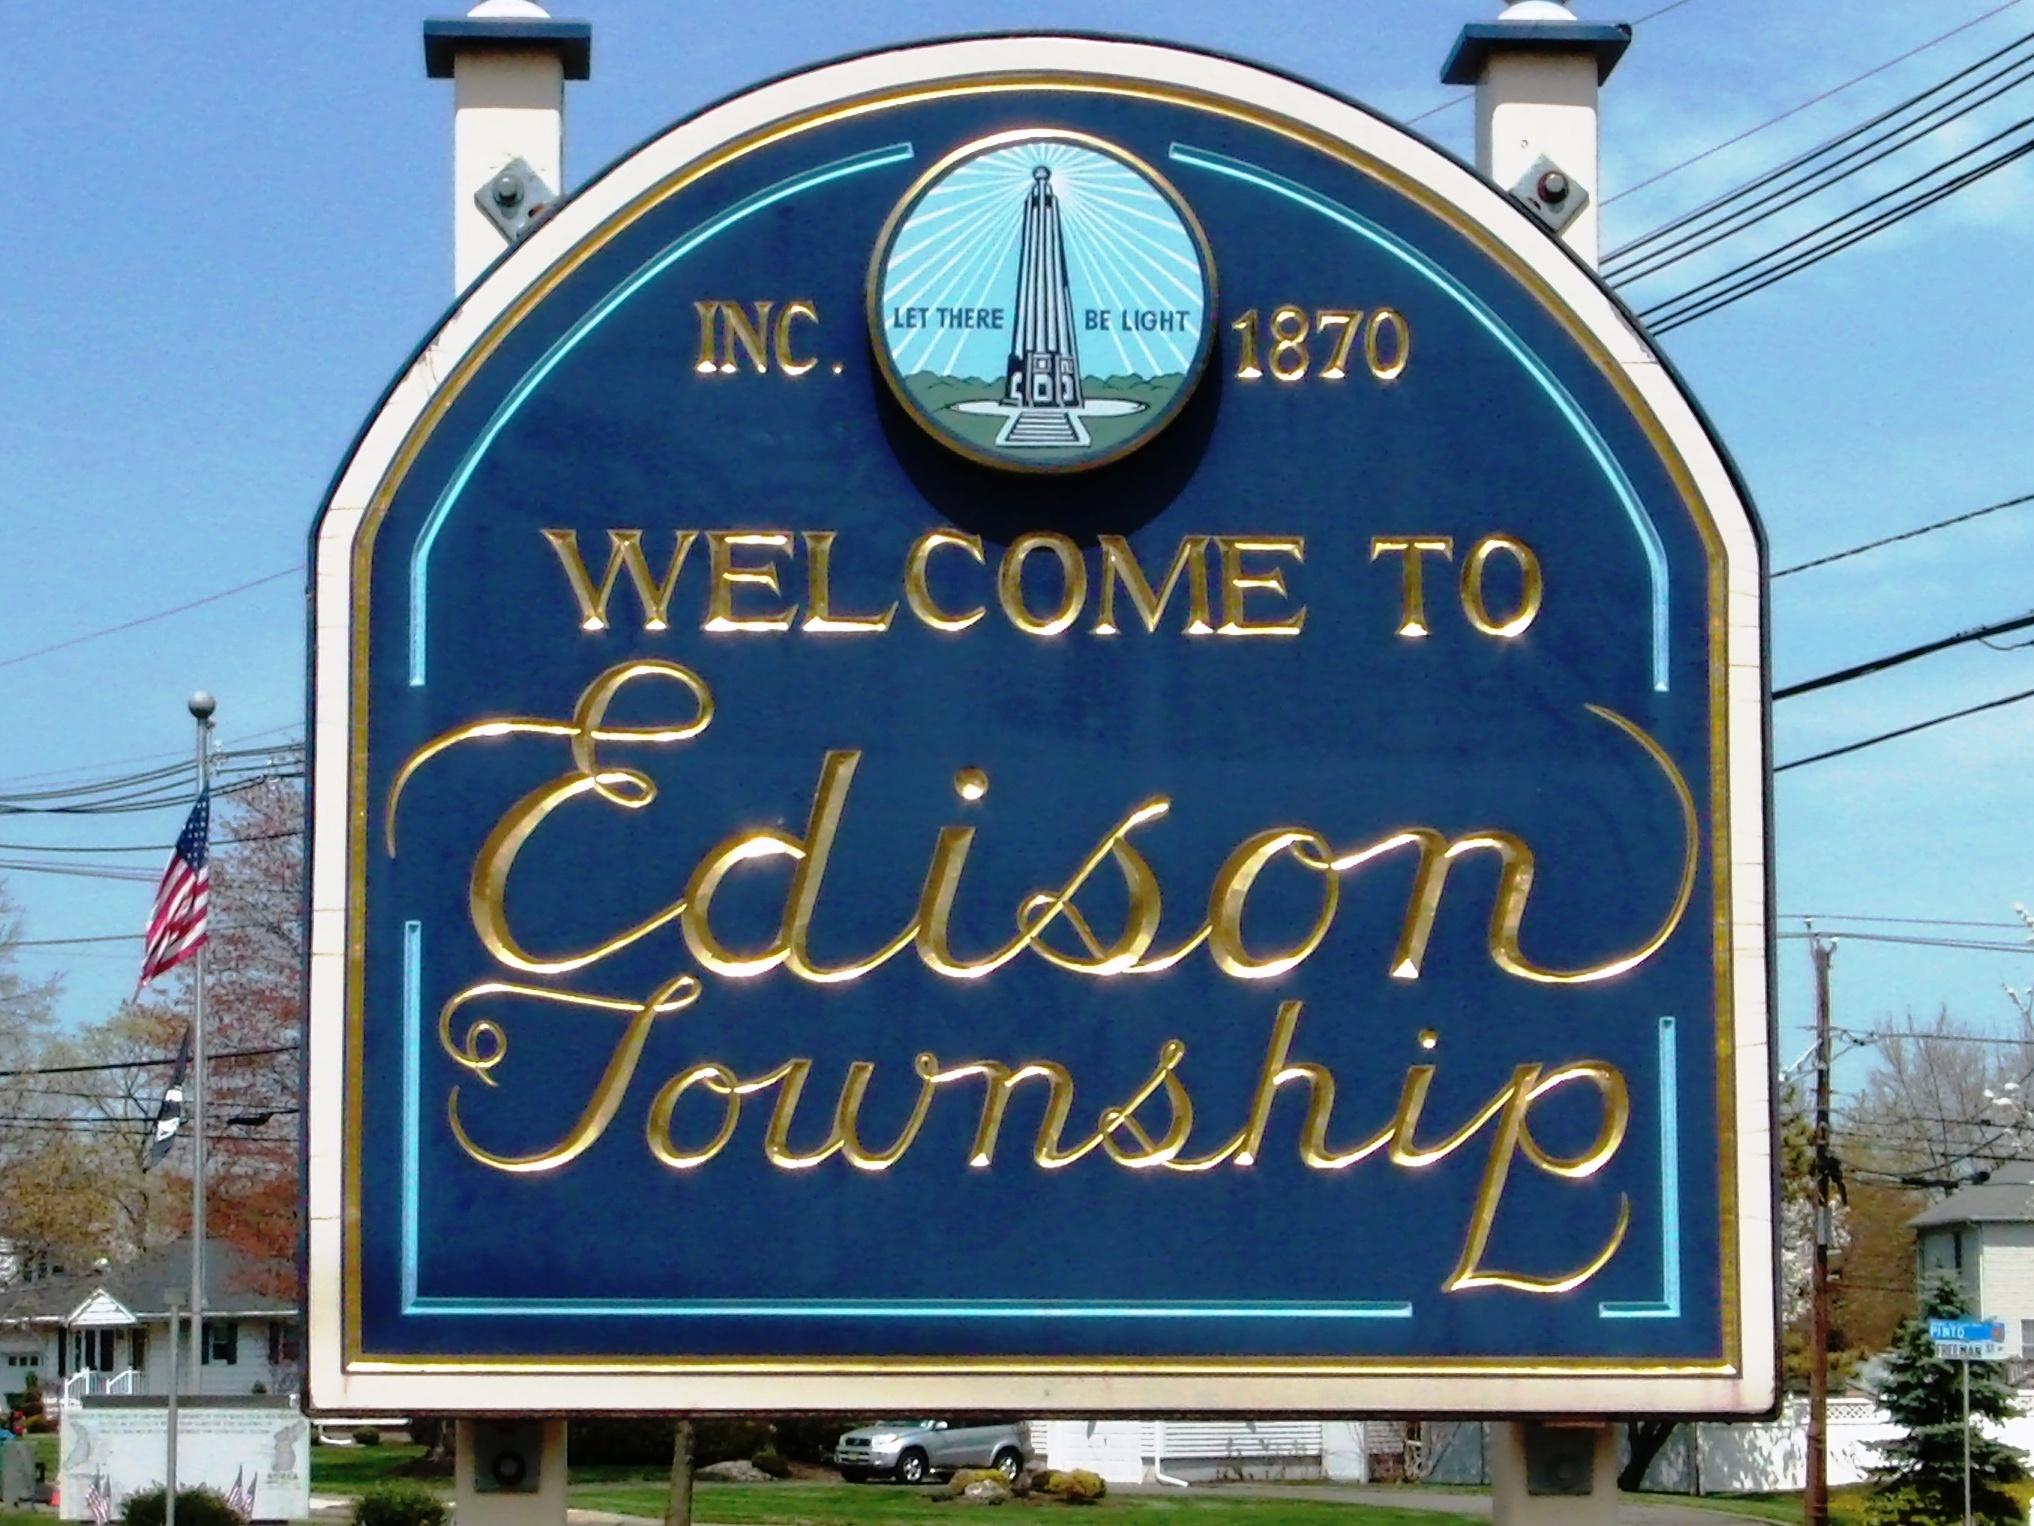 82a7918ebac9a0e10899_Sign_Welcome_To_Edison__3_.jpg